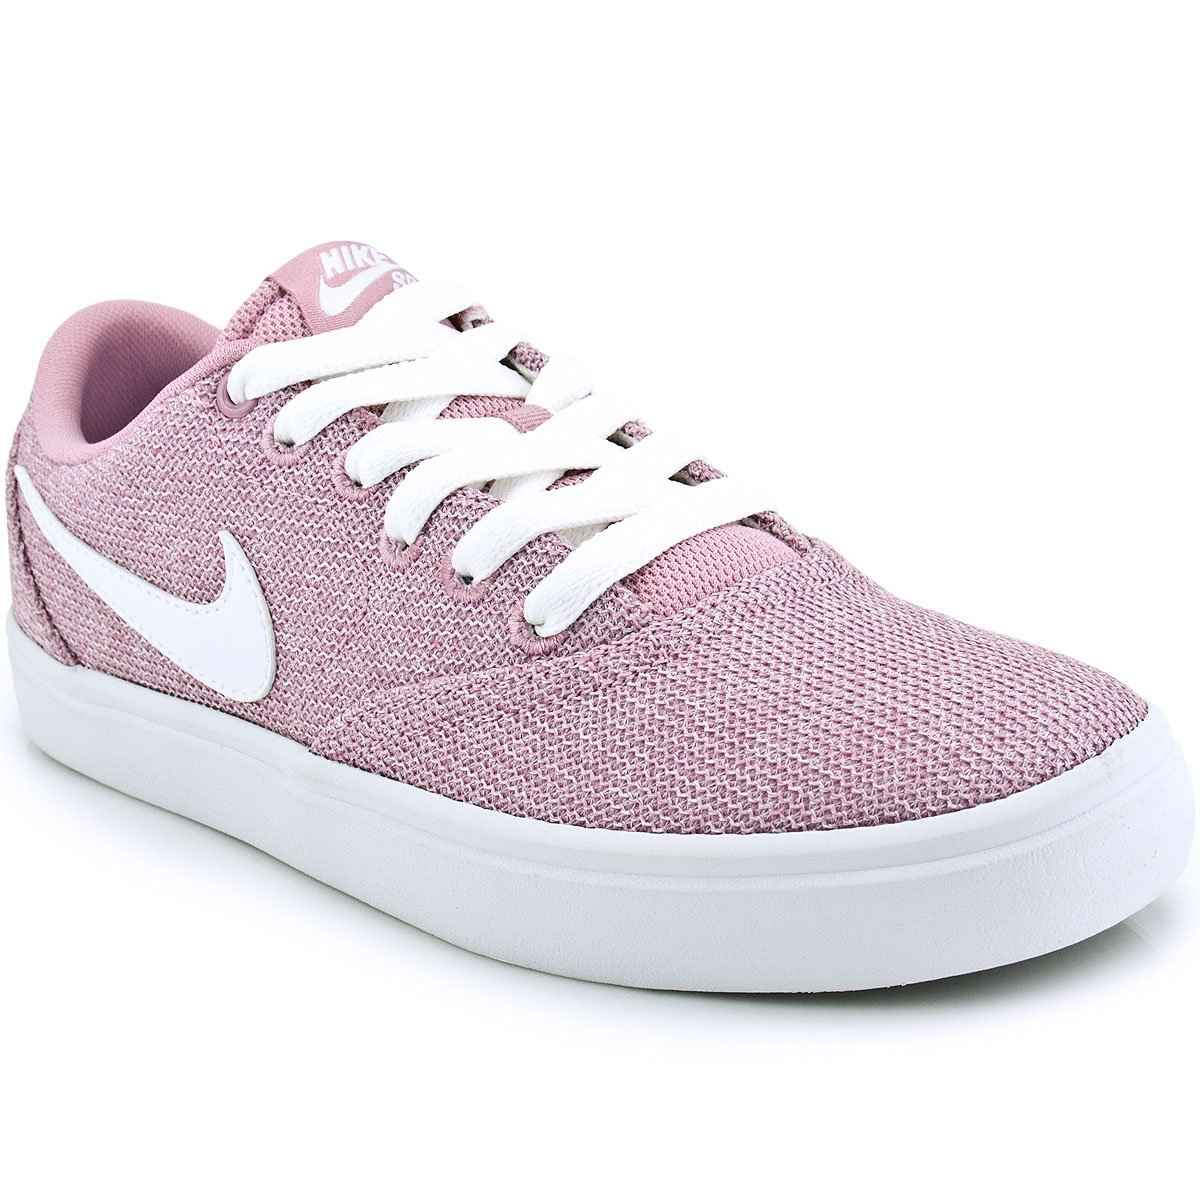 ad083cbff1109 Tênis Nike SB Check Solar CVS P Feminino   Skate   MaxTennis